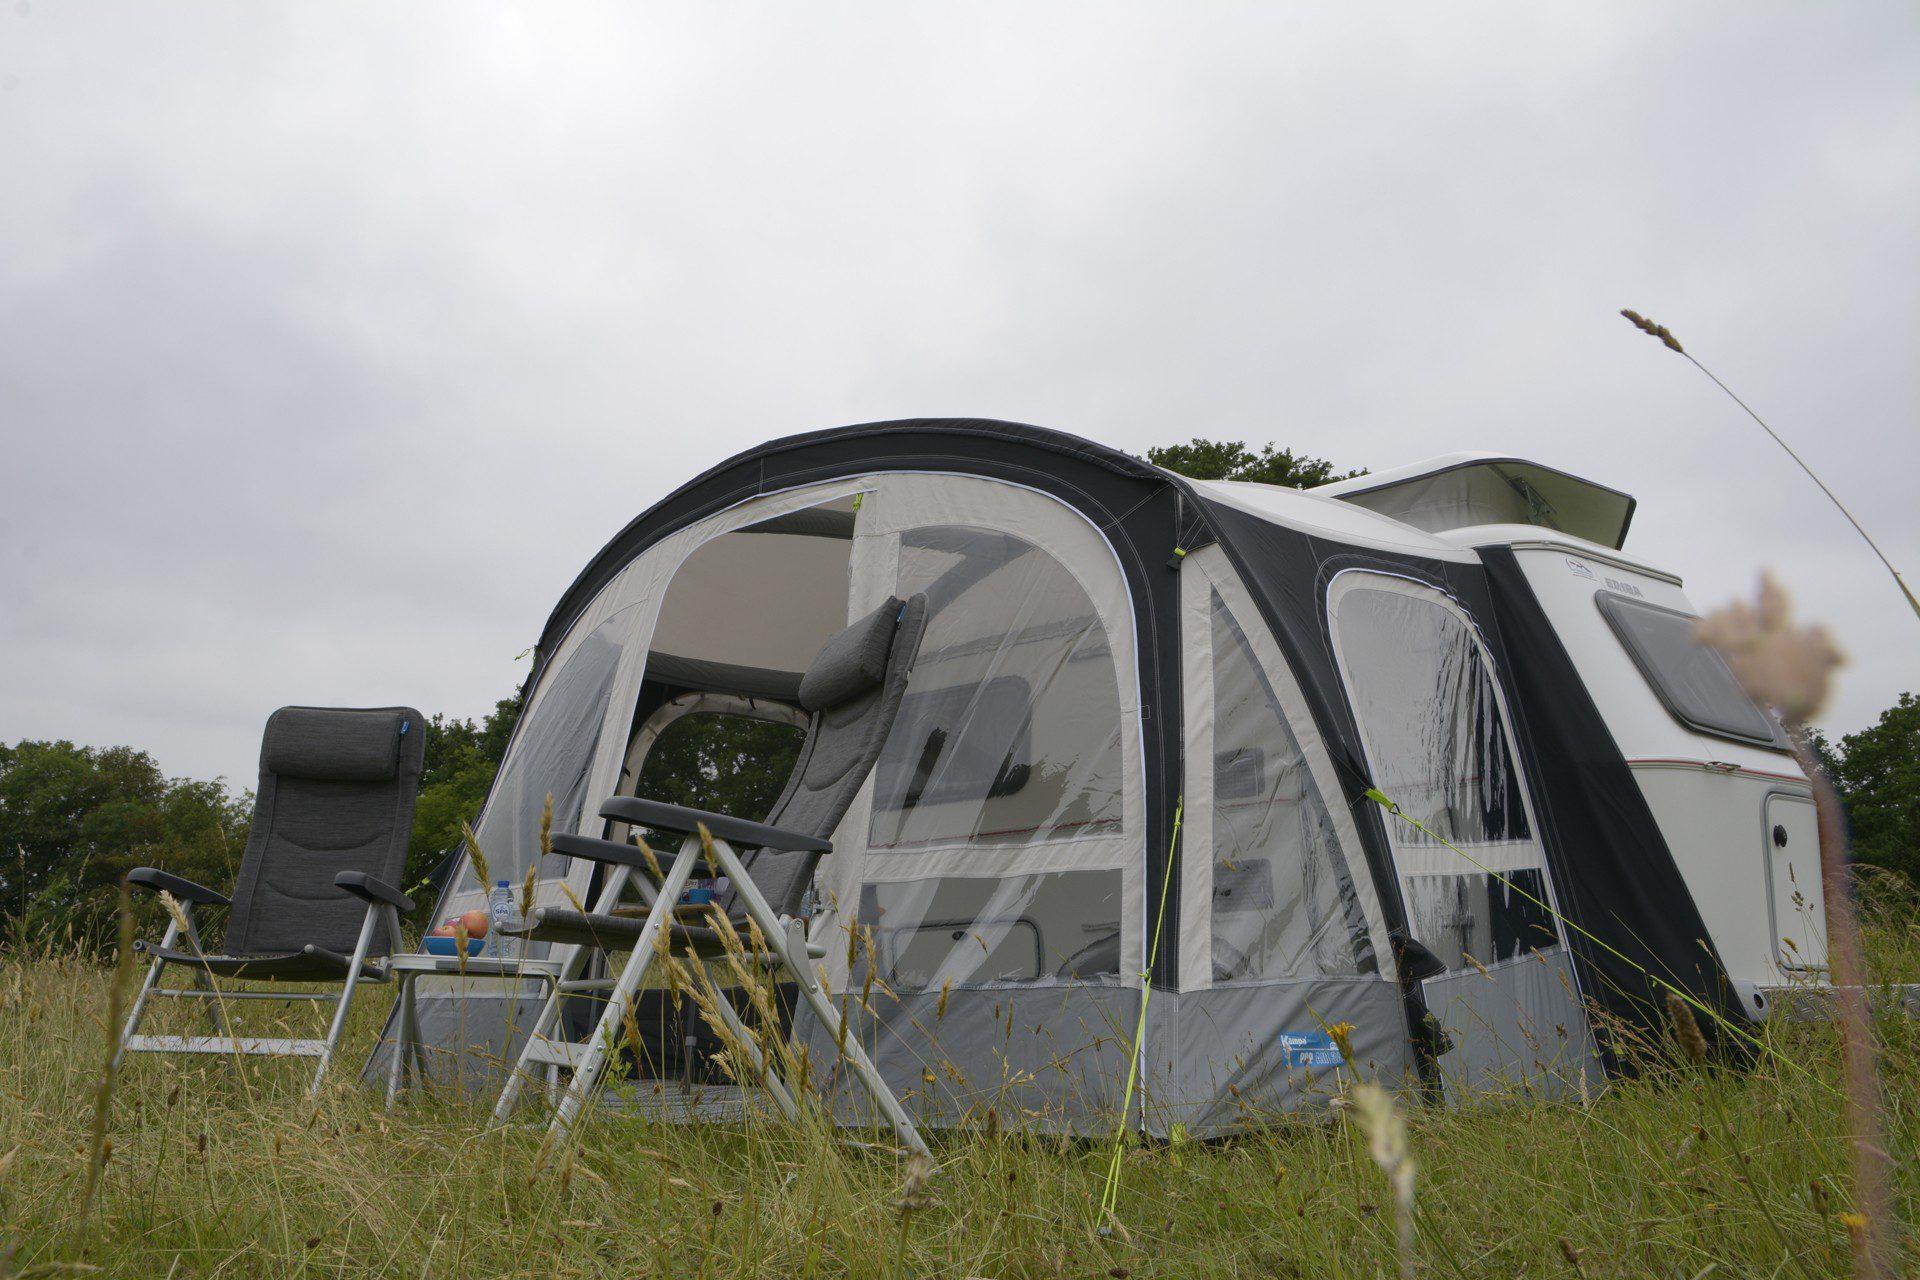 Kampa Pop Air Pro 340 Eriba Caravan Awning 2019 10